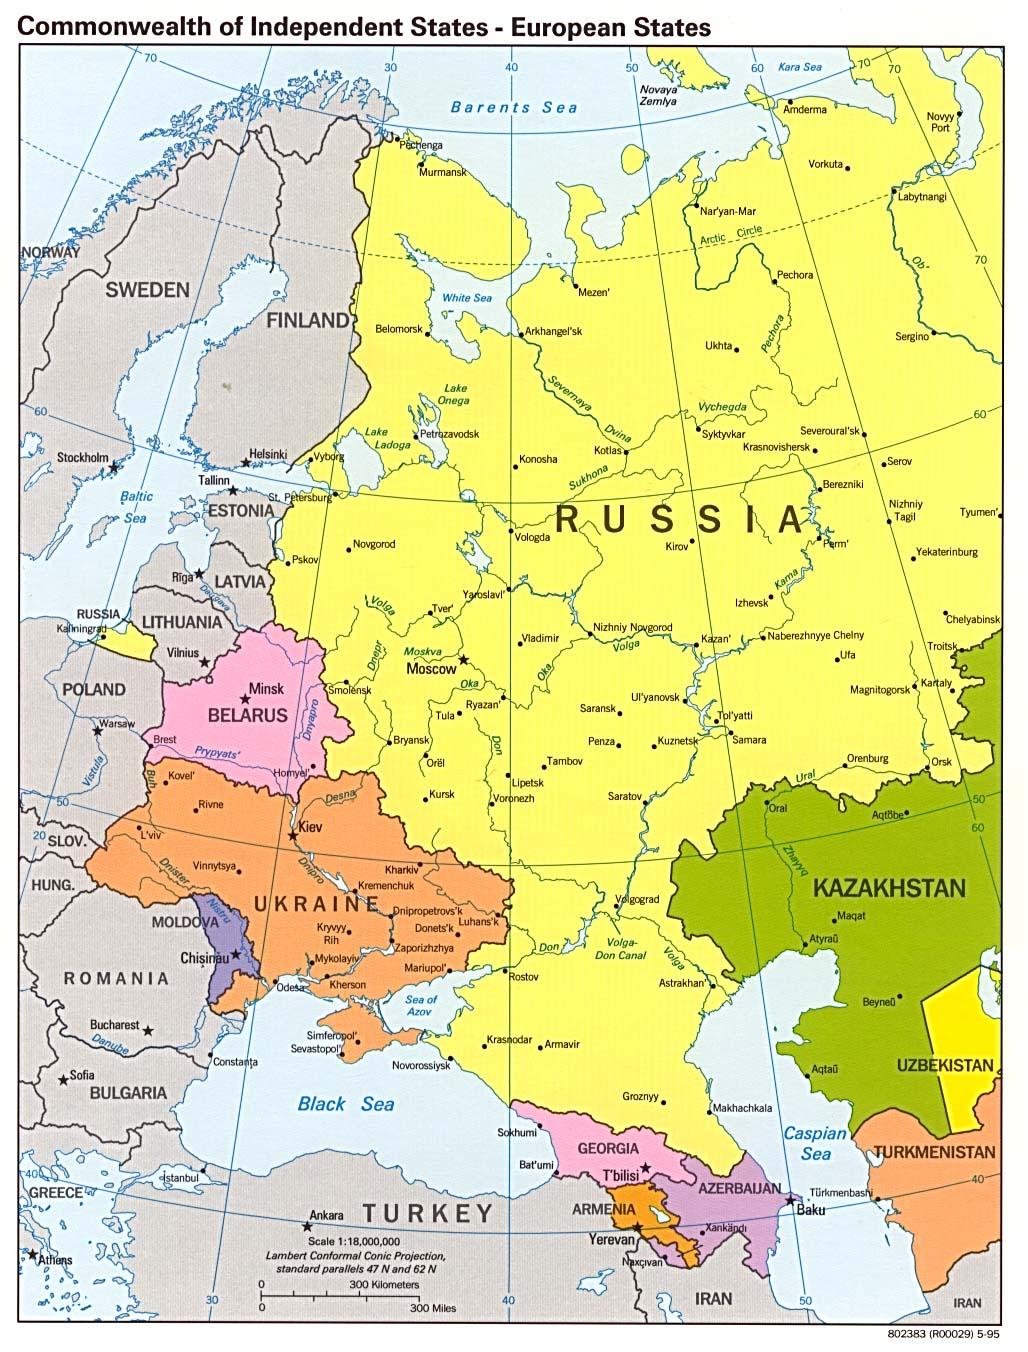 For European Russian 48